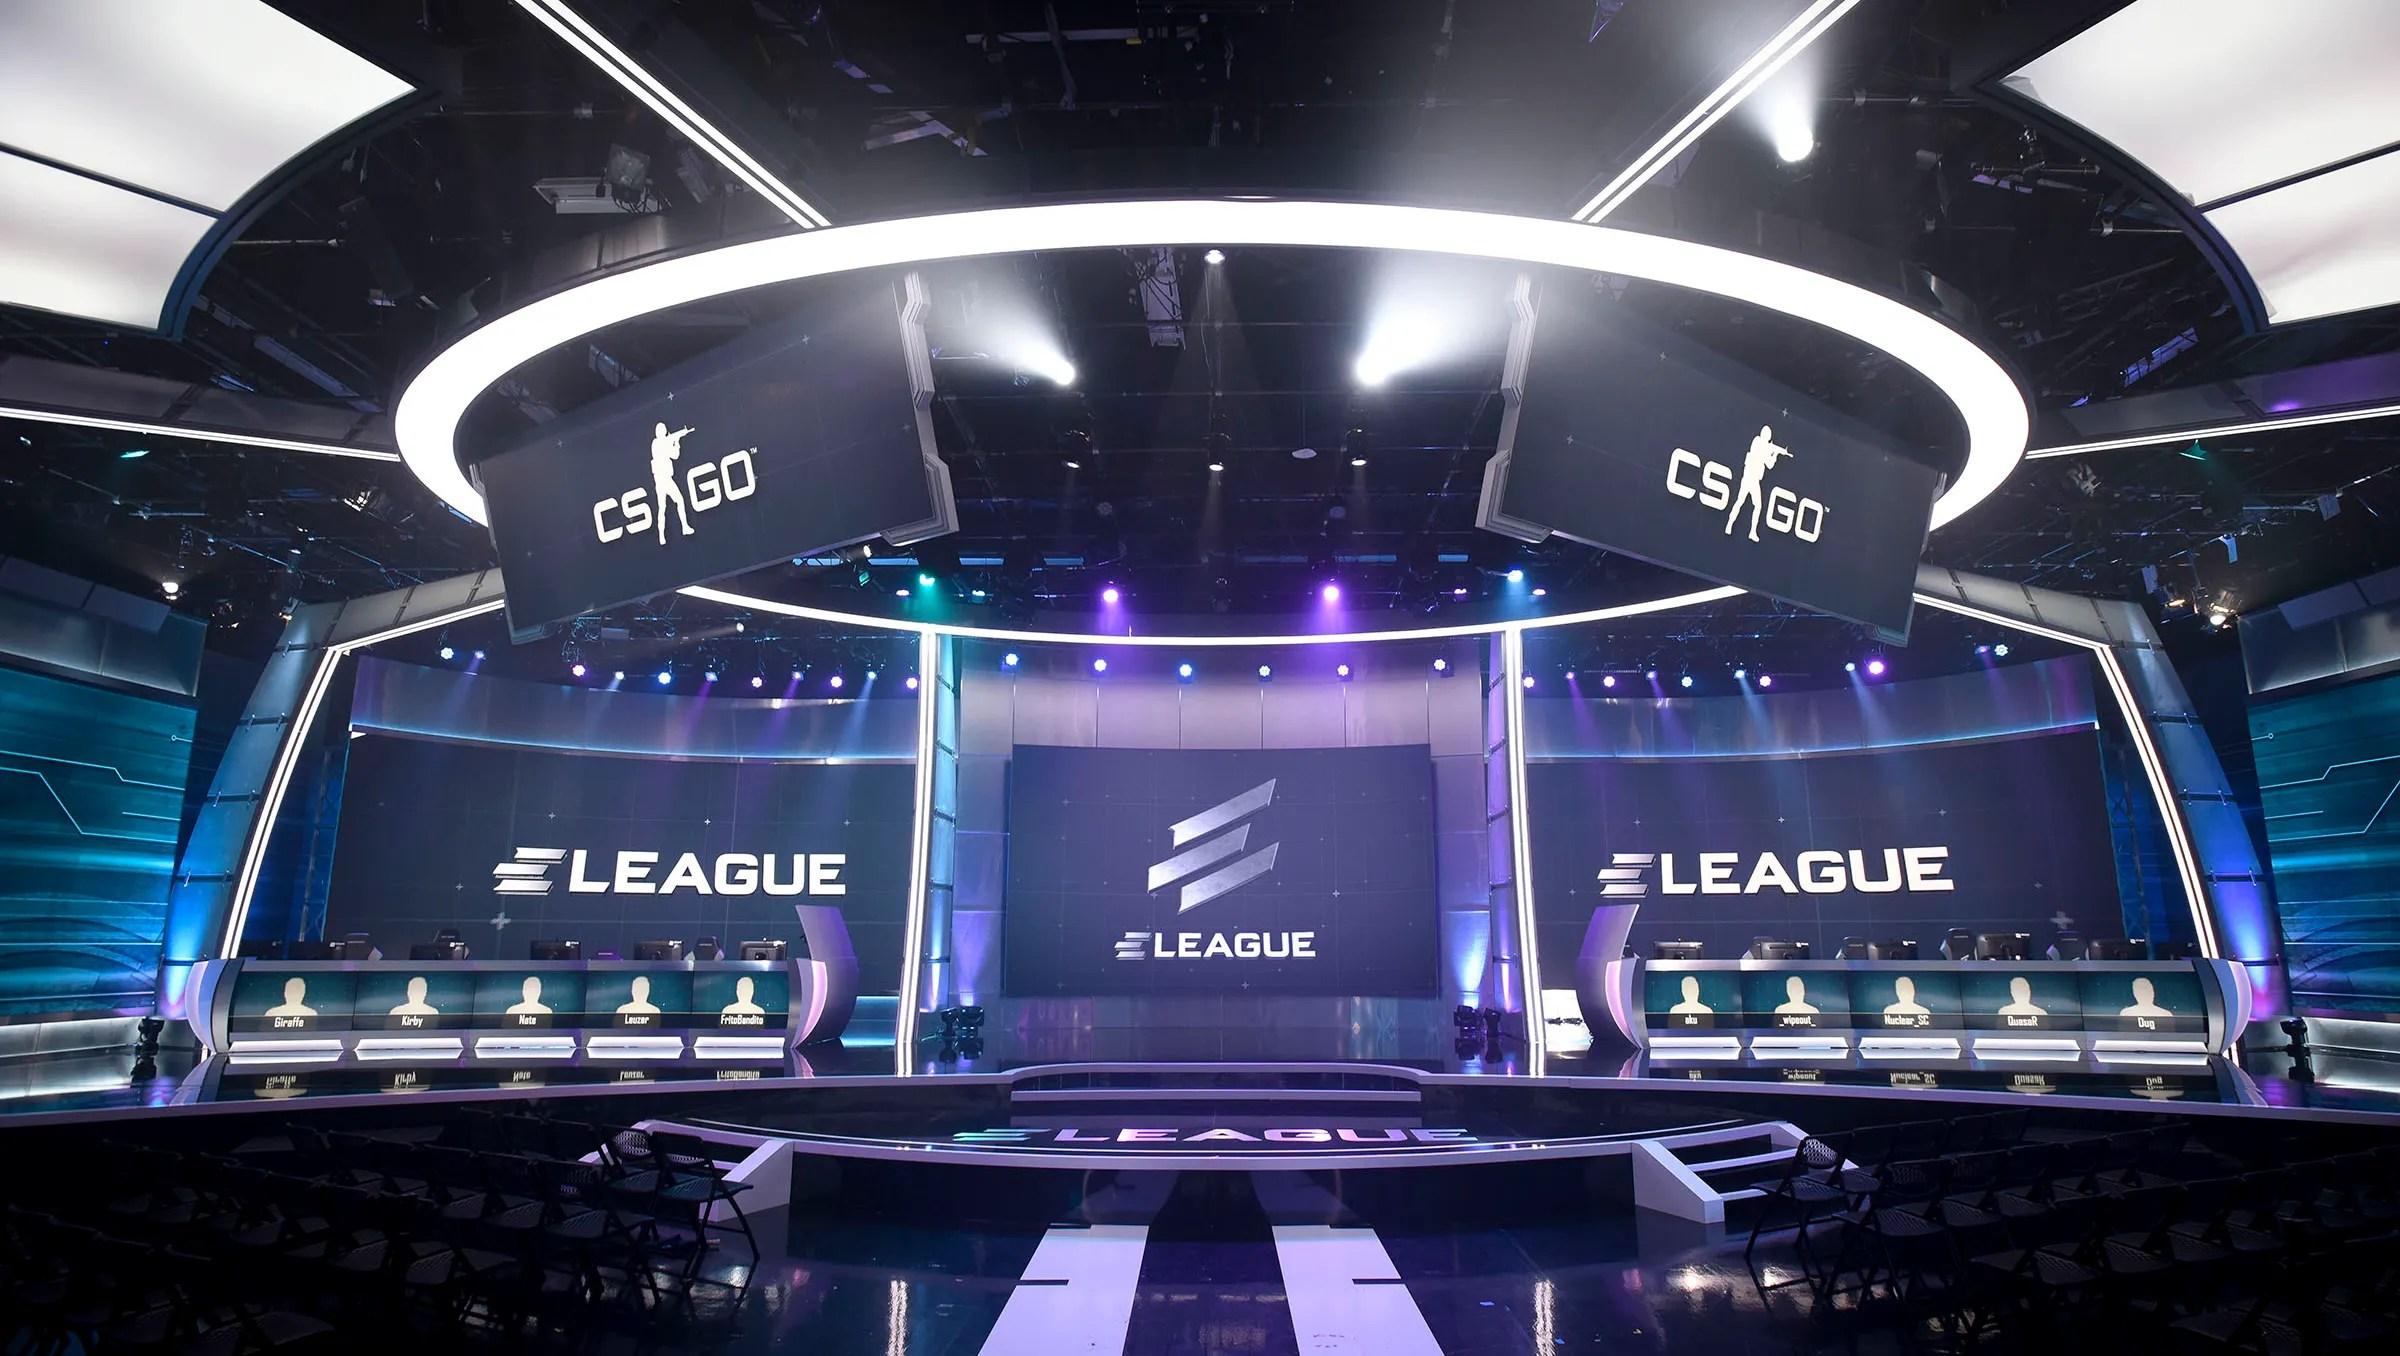 eleague gives esports new